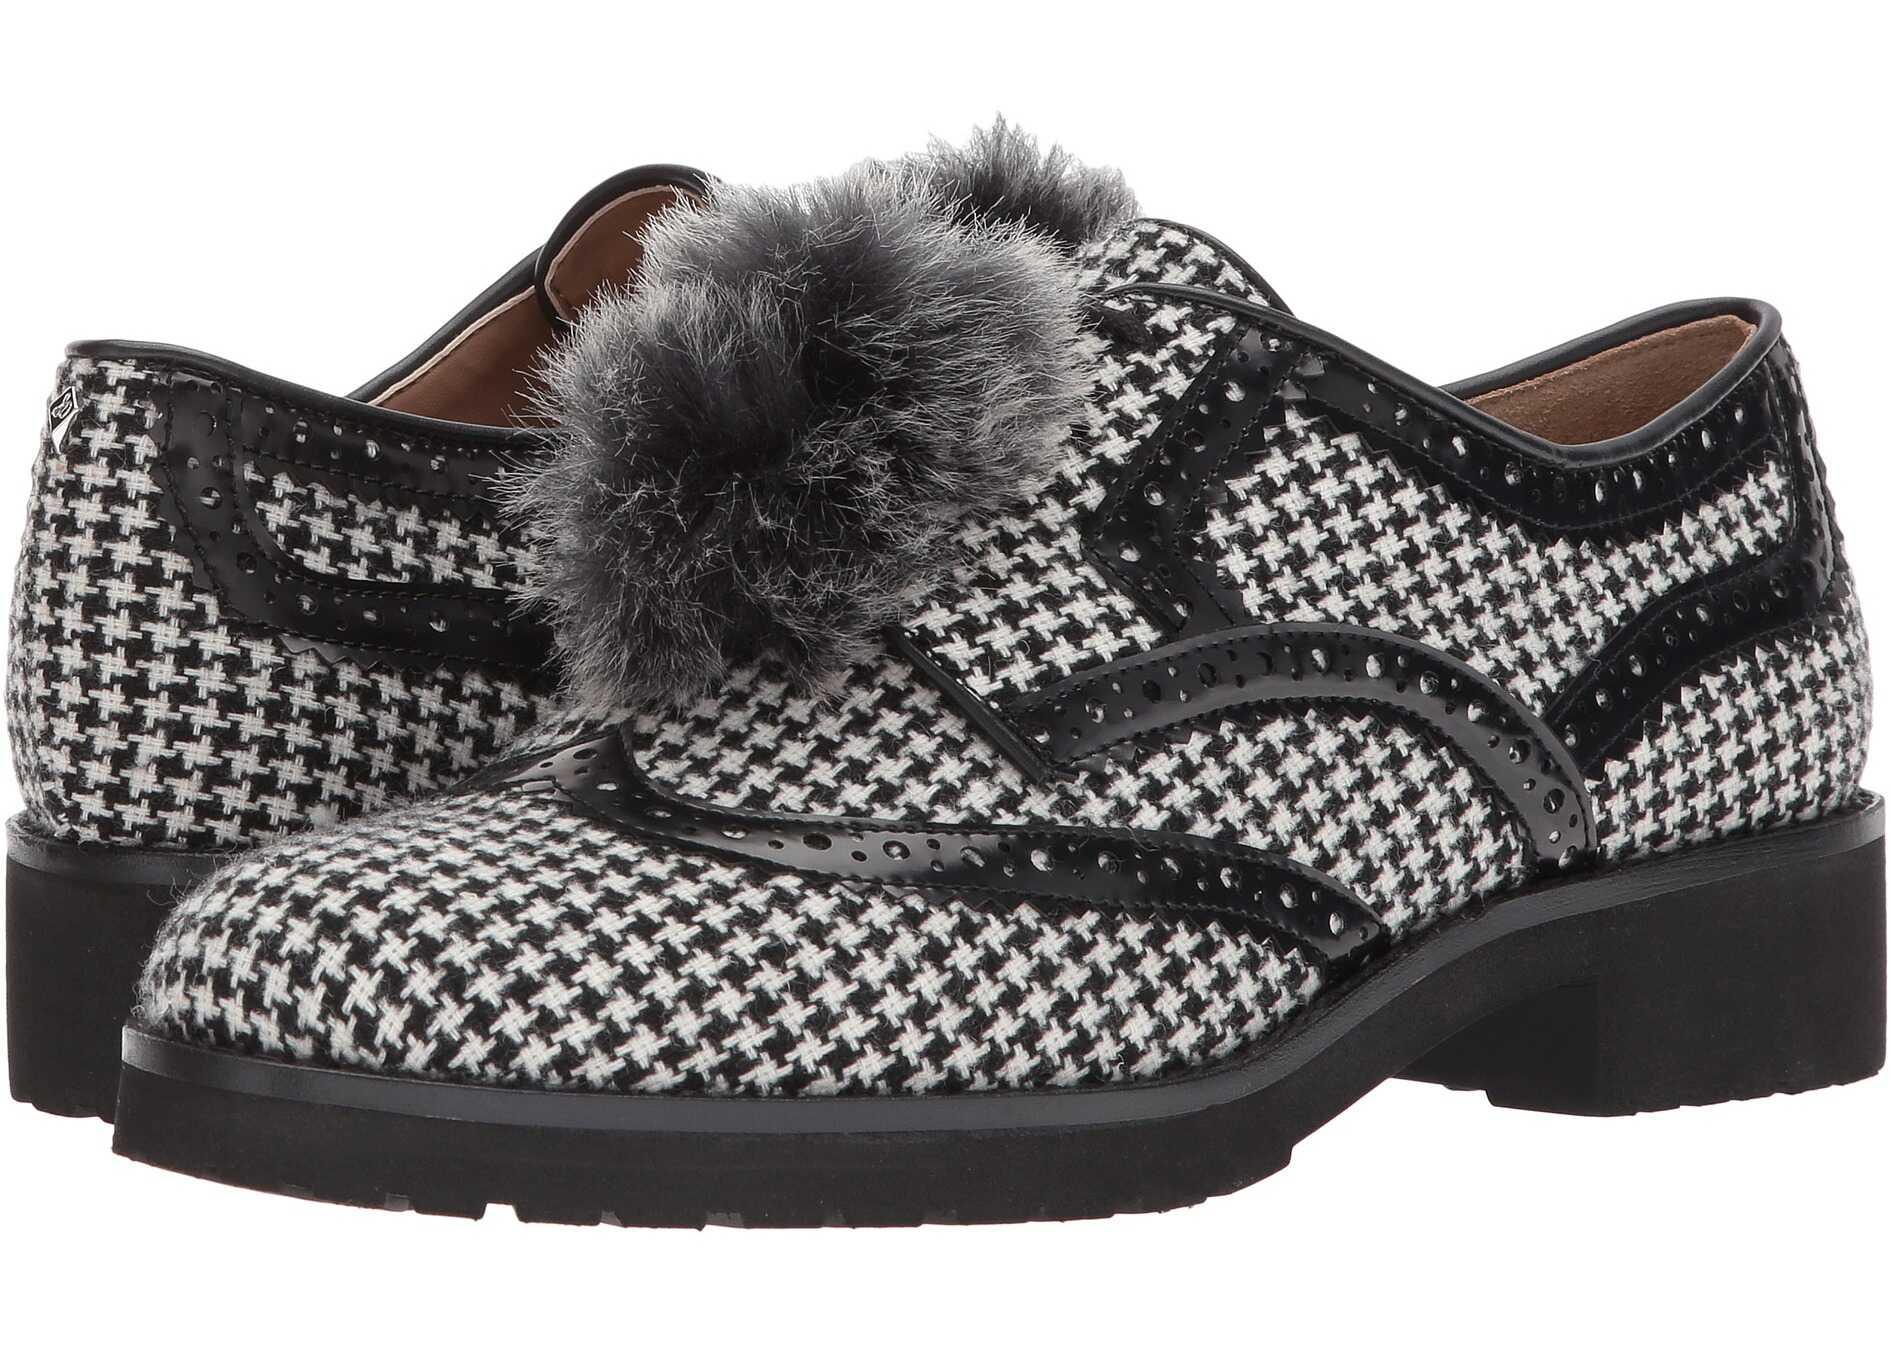 Sam Edelman Dahl Black/White Mini Houndstooth/Brush-Off Box Leather